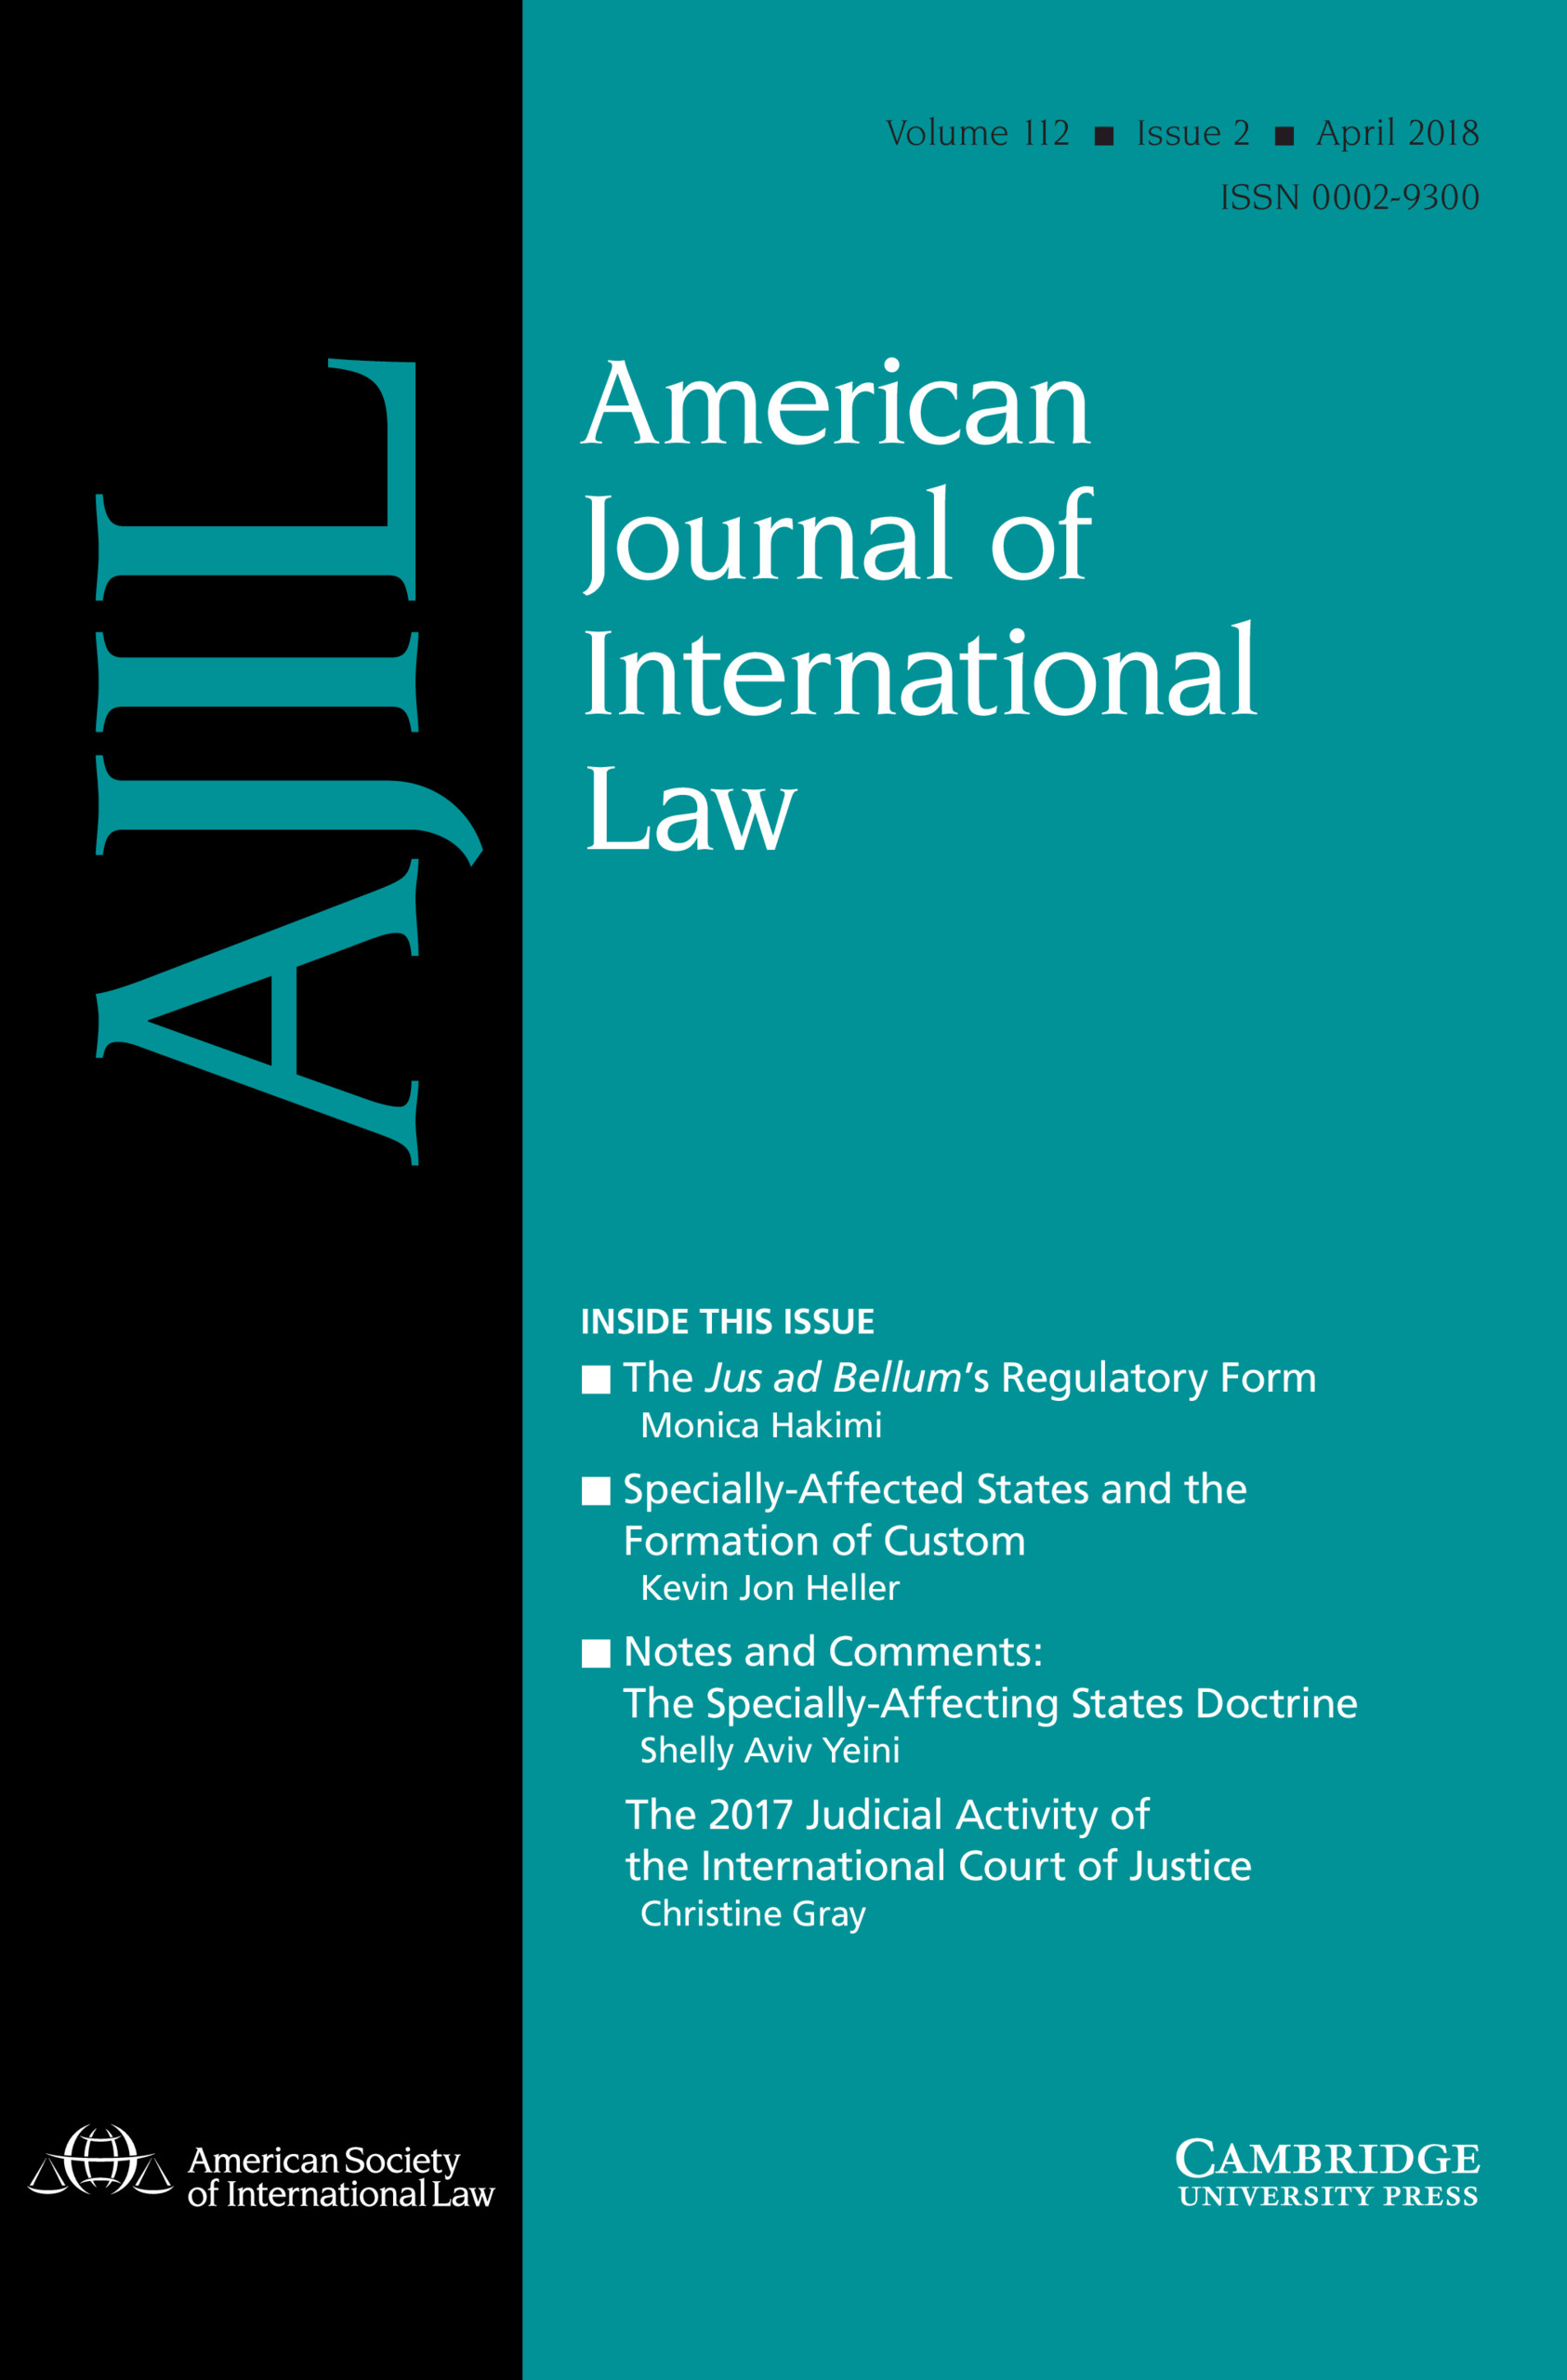 Dünyada ki En Popüler 5 Hukuk Dergisi - American Journal of International Law